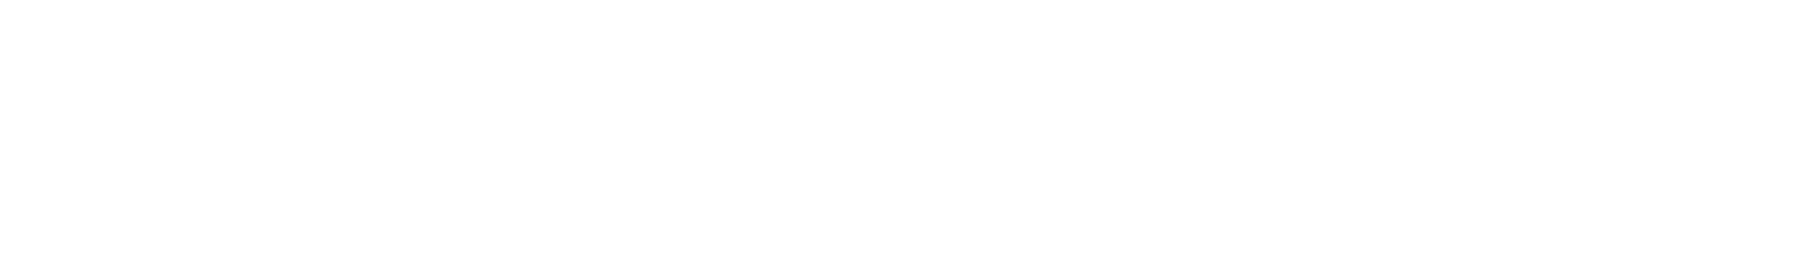 197707 loop 2 150 bpm 32beats wave